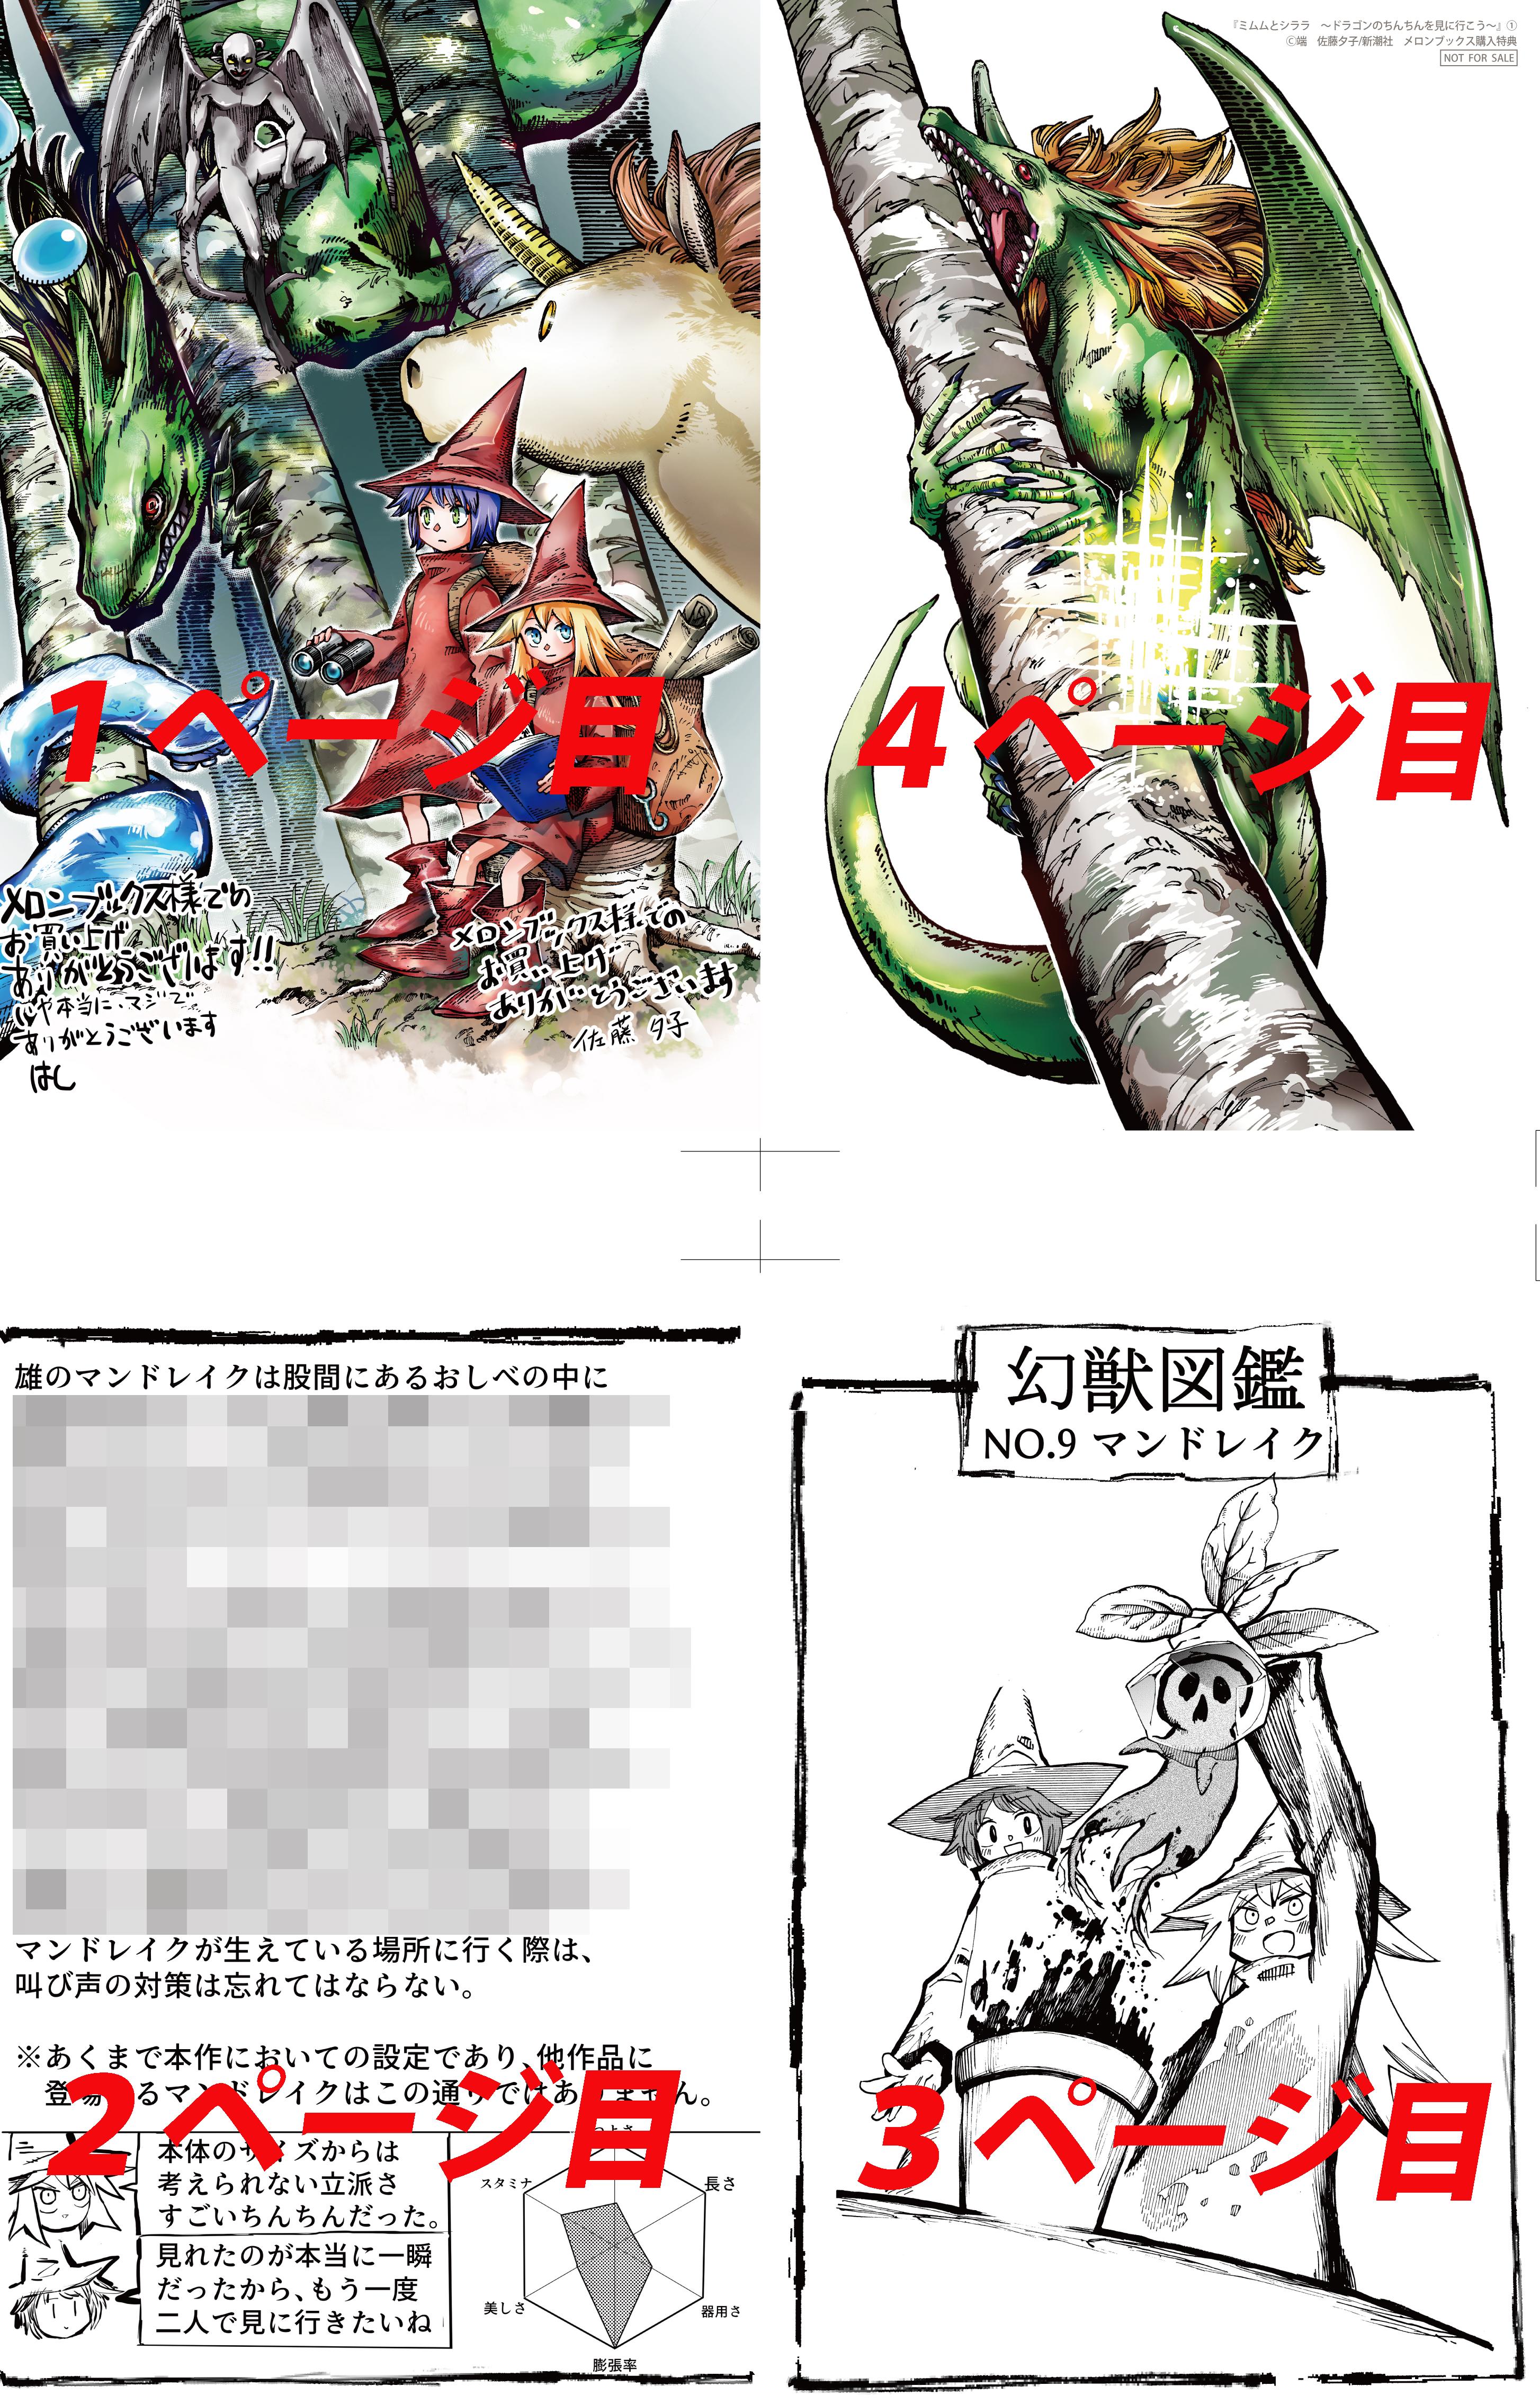 f:id:kuragebunch:20211009111740j:plain